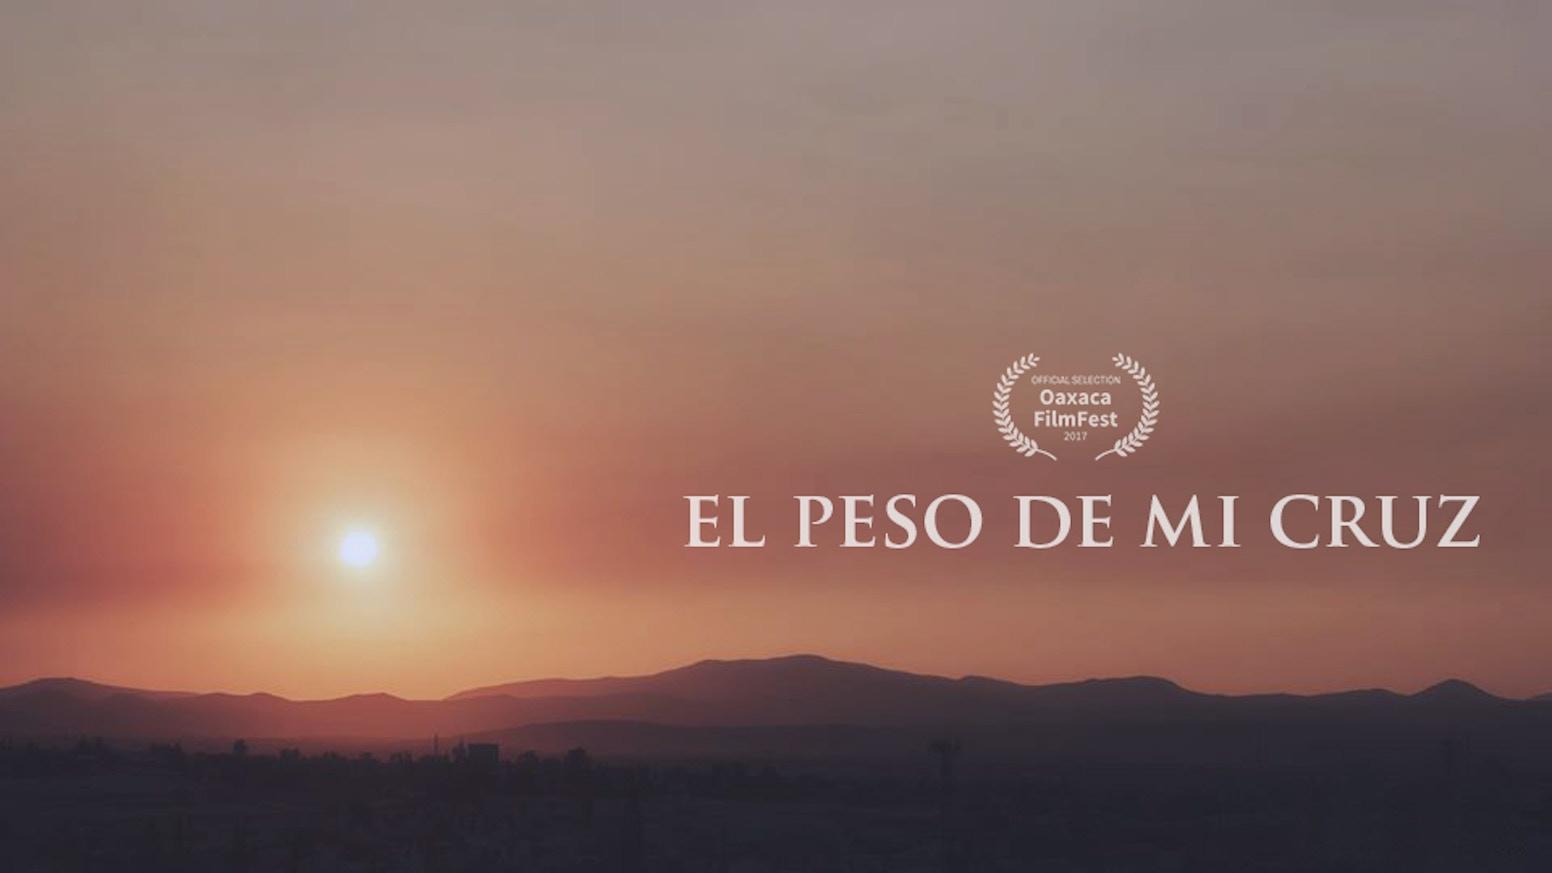 Cortometraje | El peso de mi cruz by Marco Jiménez — Kickstarter